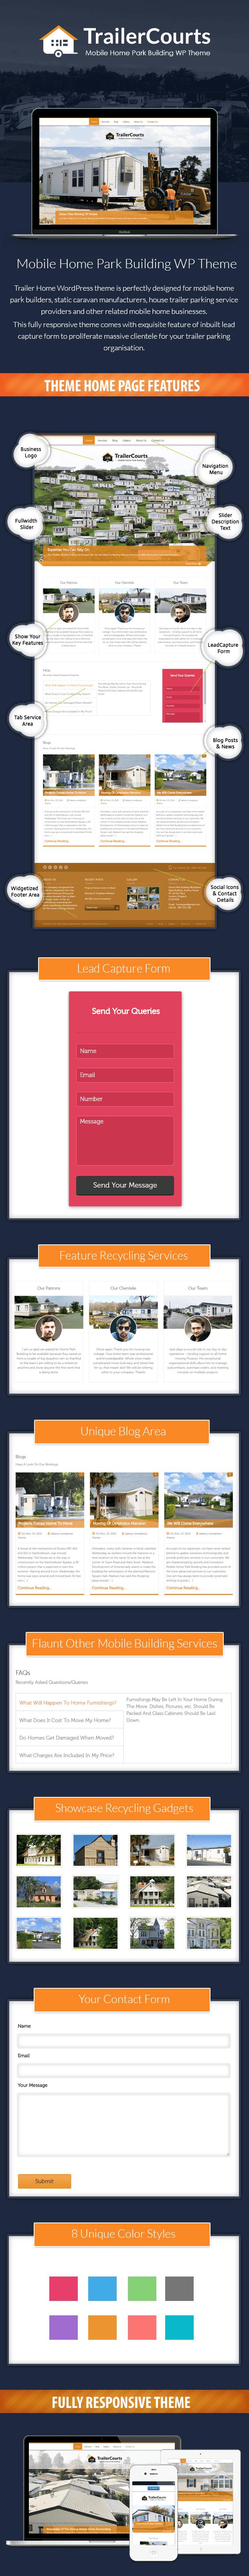 TrailerCourts WordPress Theme Sales Page